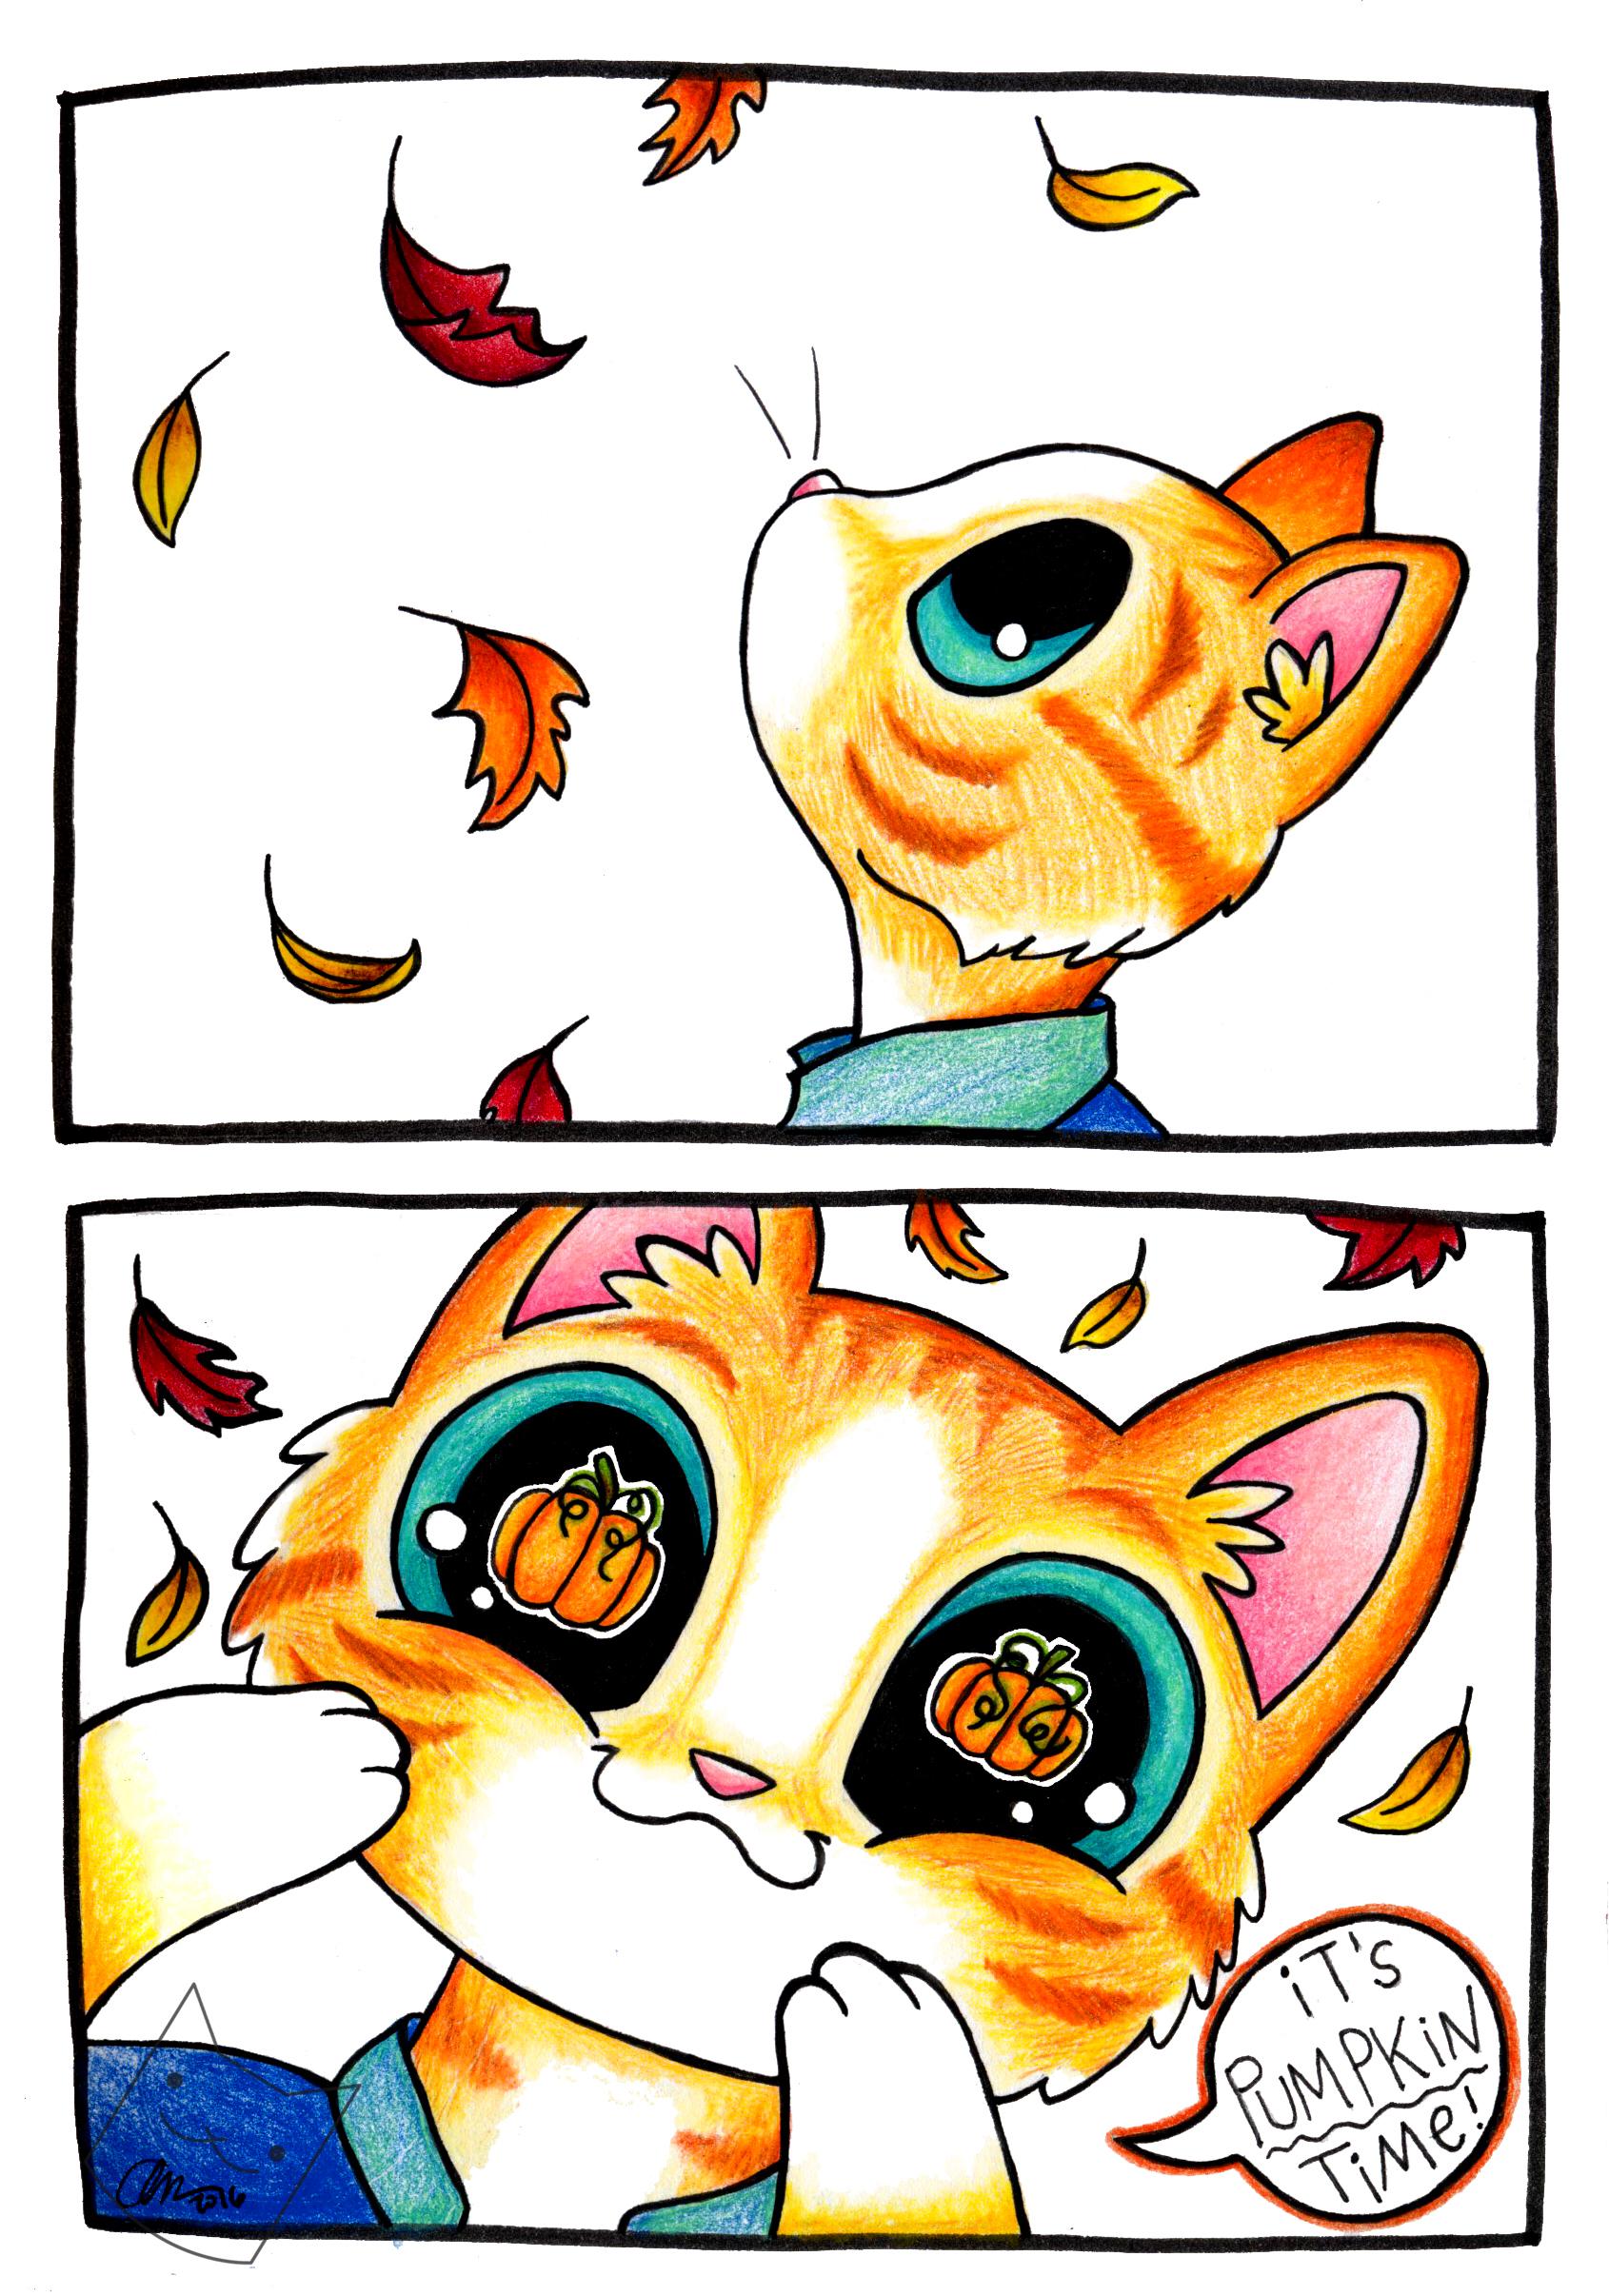 """It's Pumpkin Time!"""